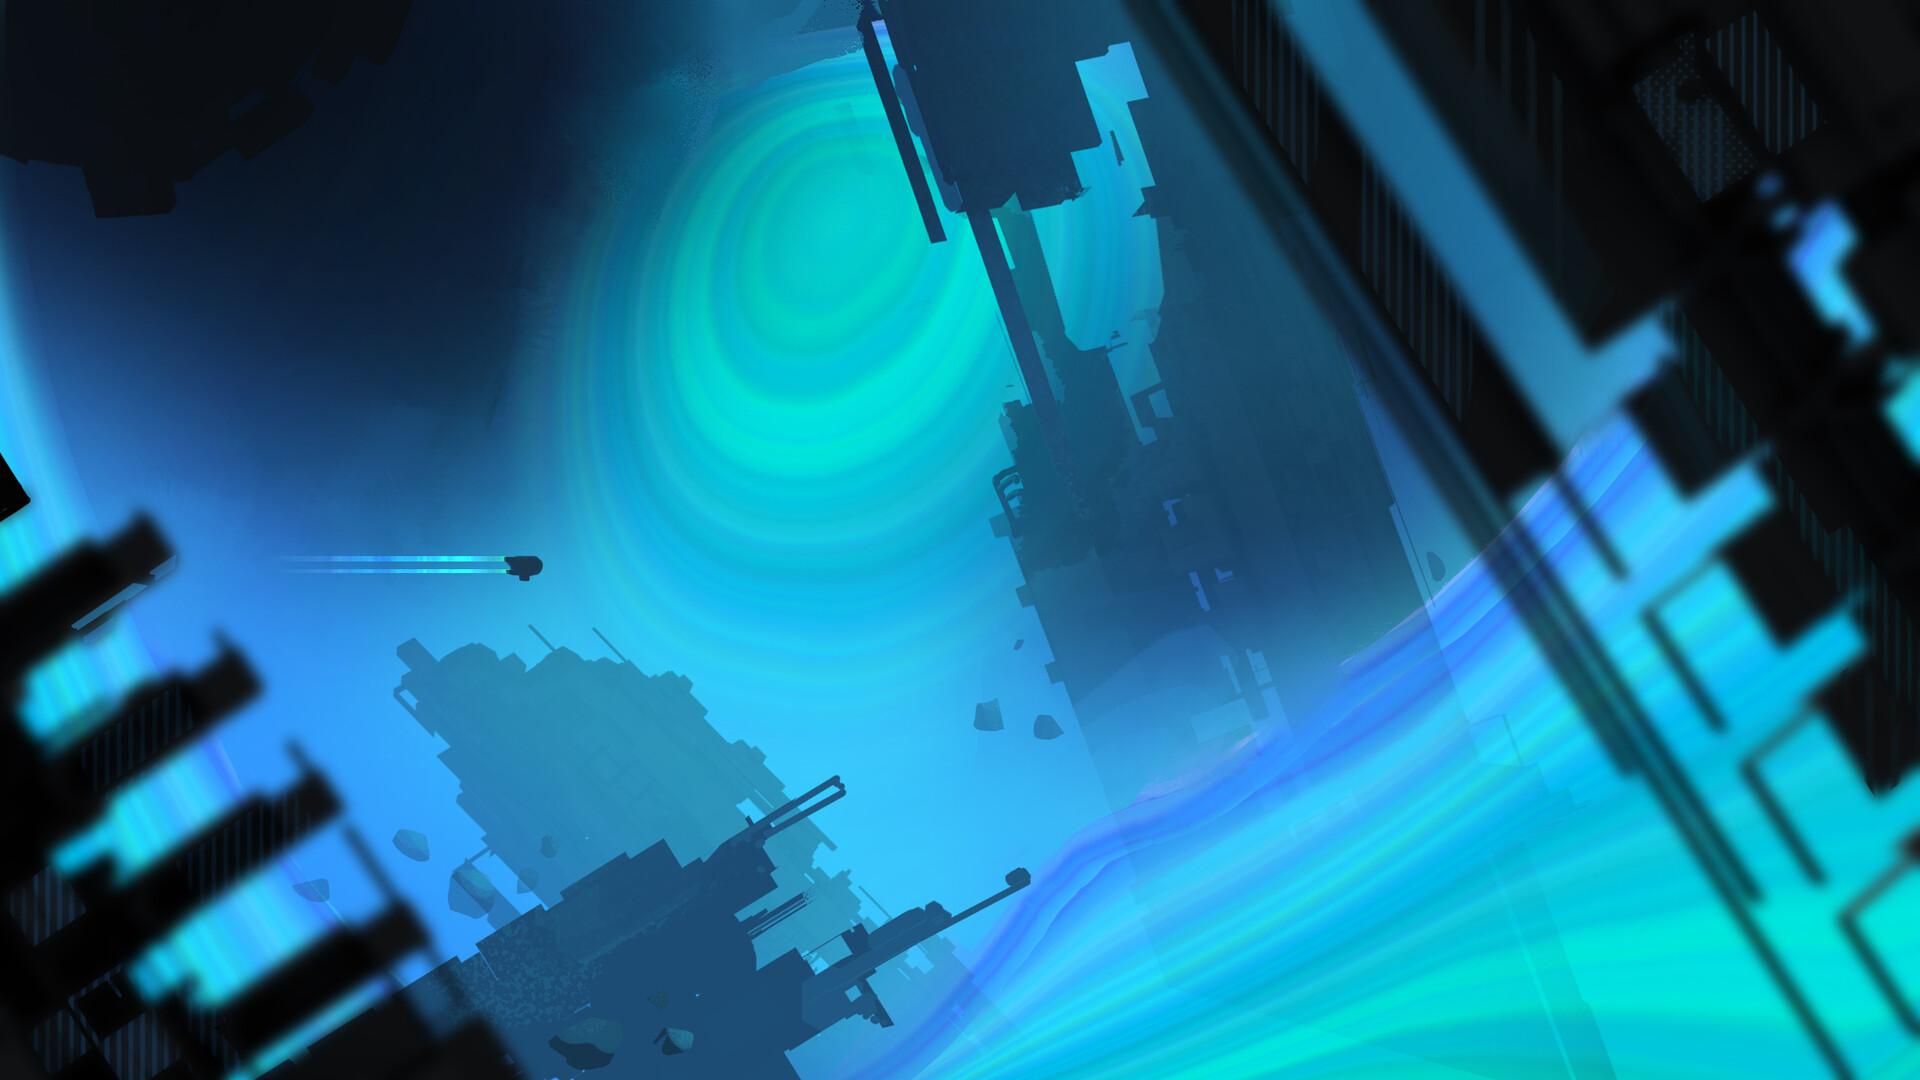 Leon tukker sketch space3